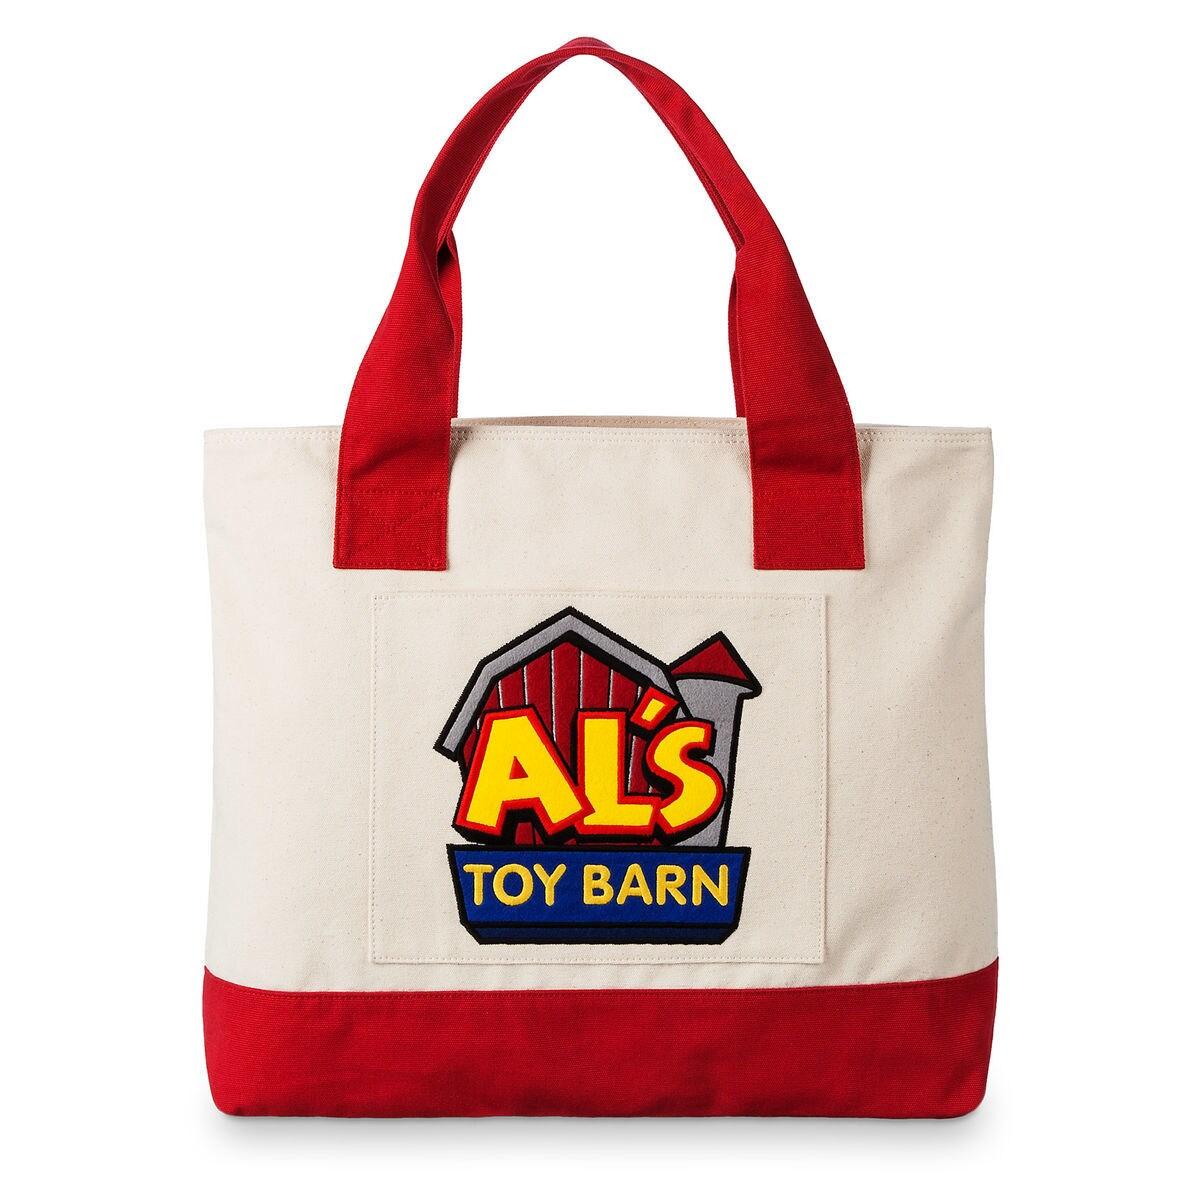 Product Image of Al s Toy Barn Large Tote Bag - Toy Story   1 e5e2a82a1c45e